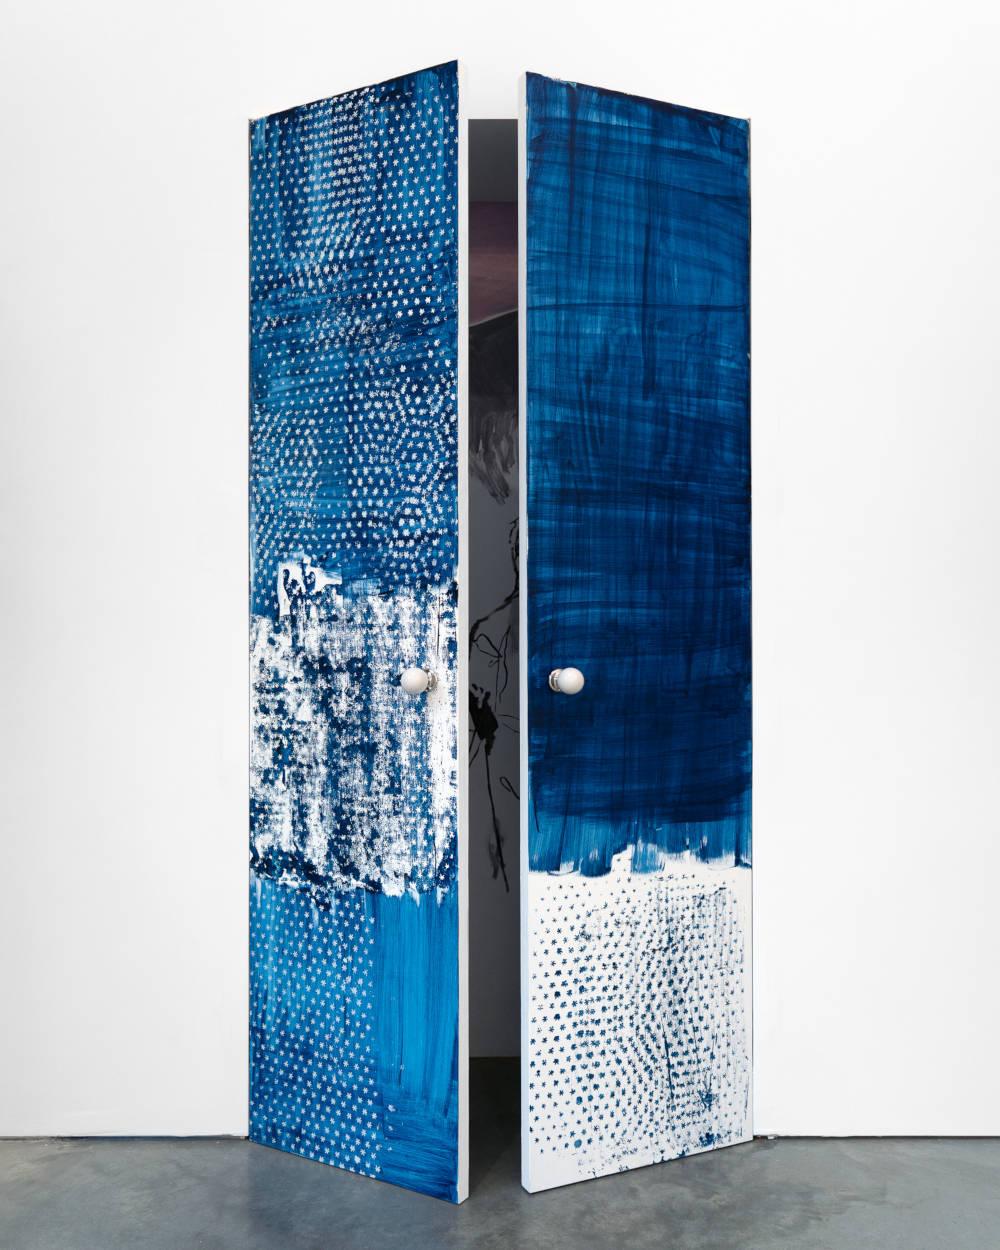 303 Gallery Nick Mauss 5